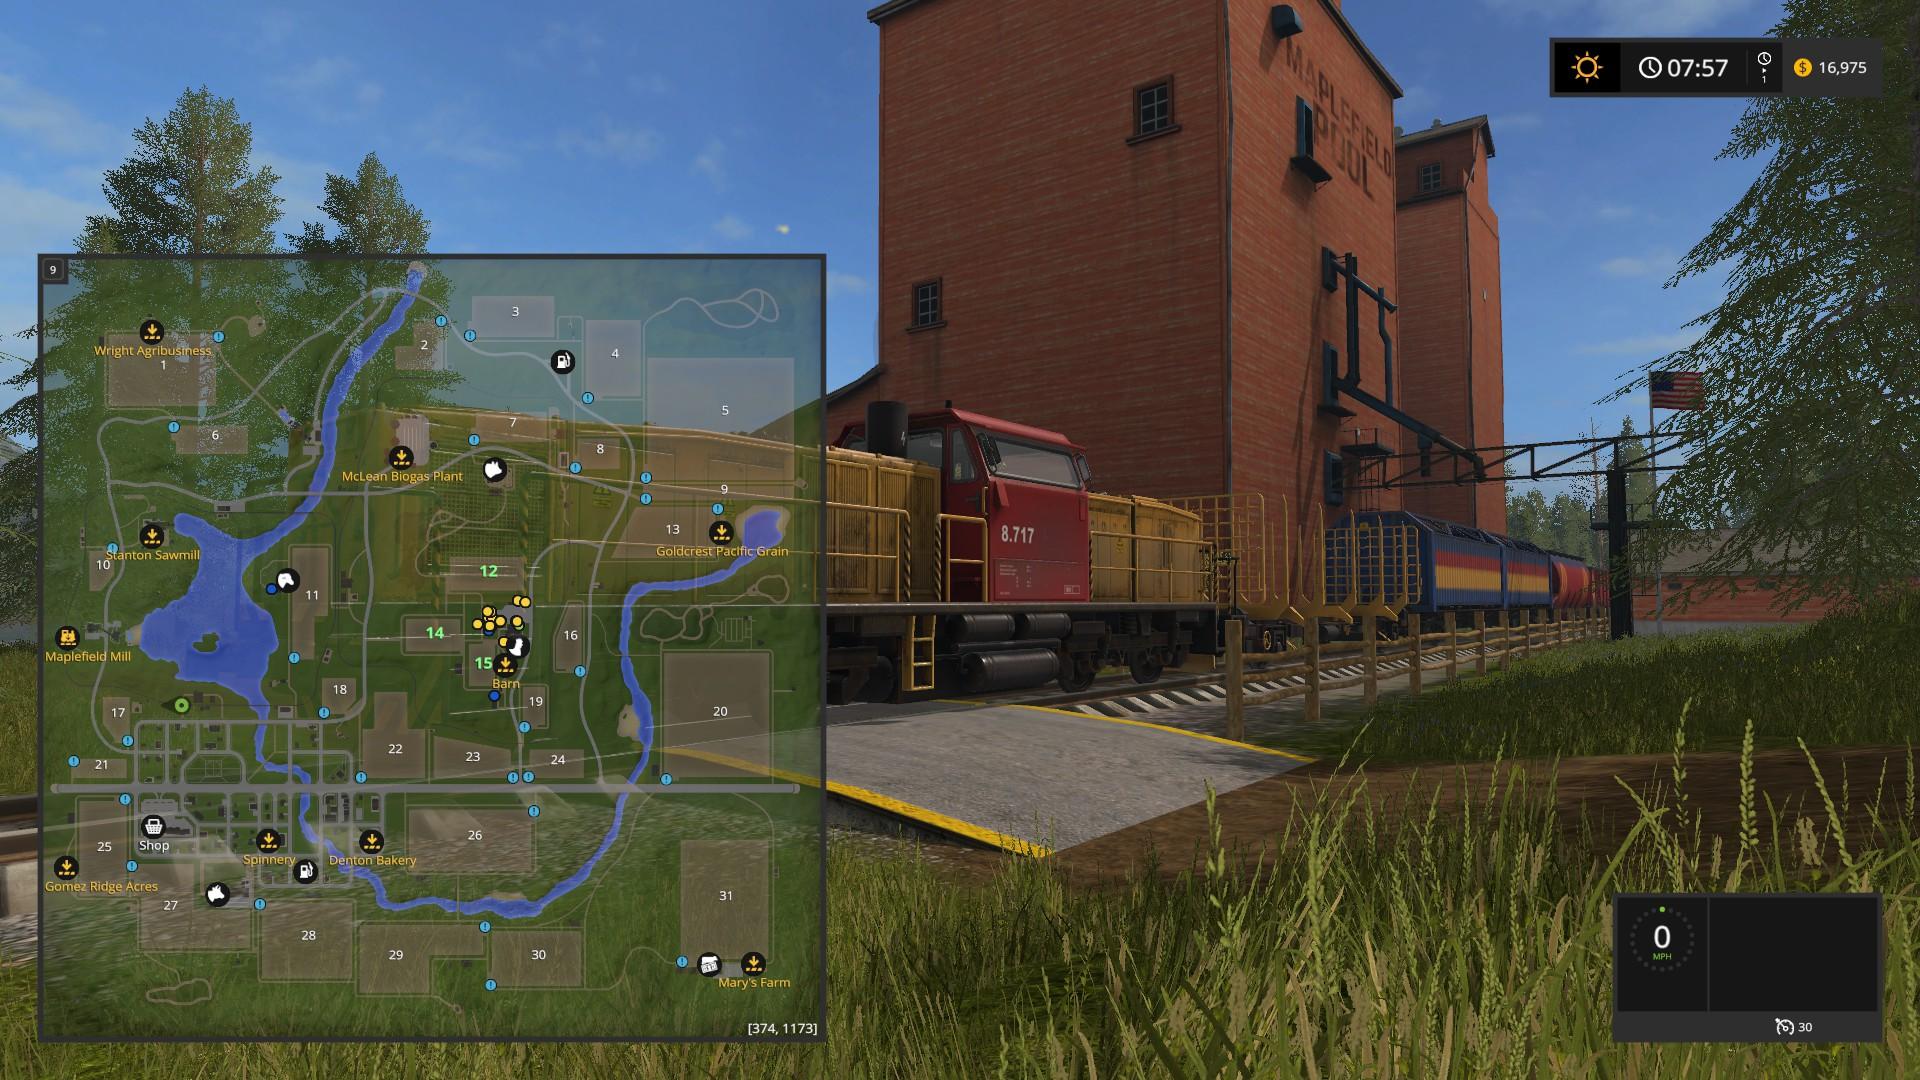 Farming Simulator 17 - Basic Training: Using the Train to Gather Grain